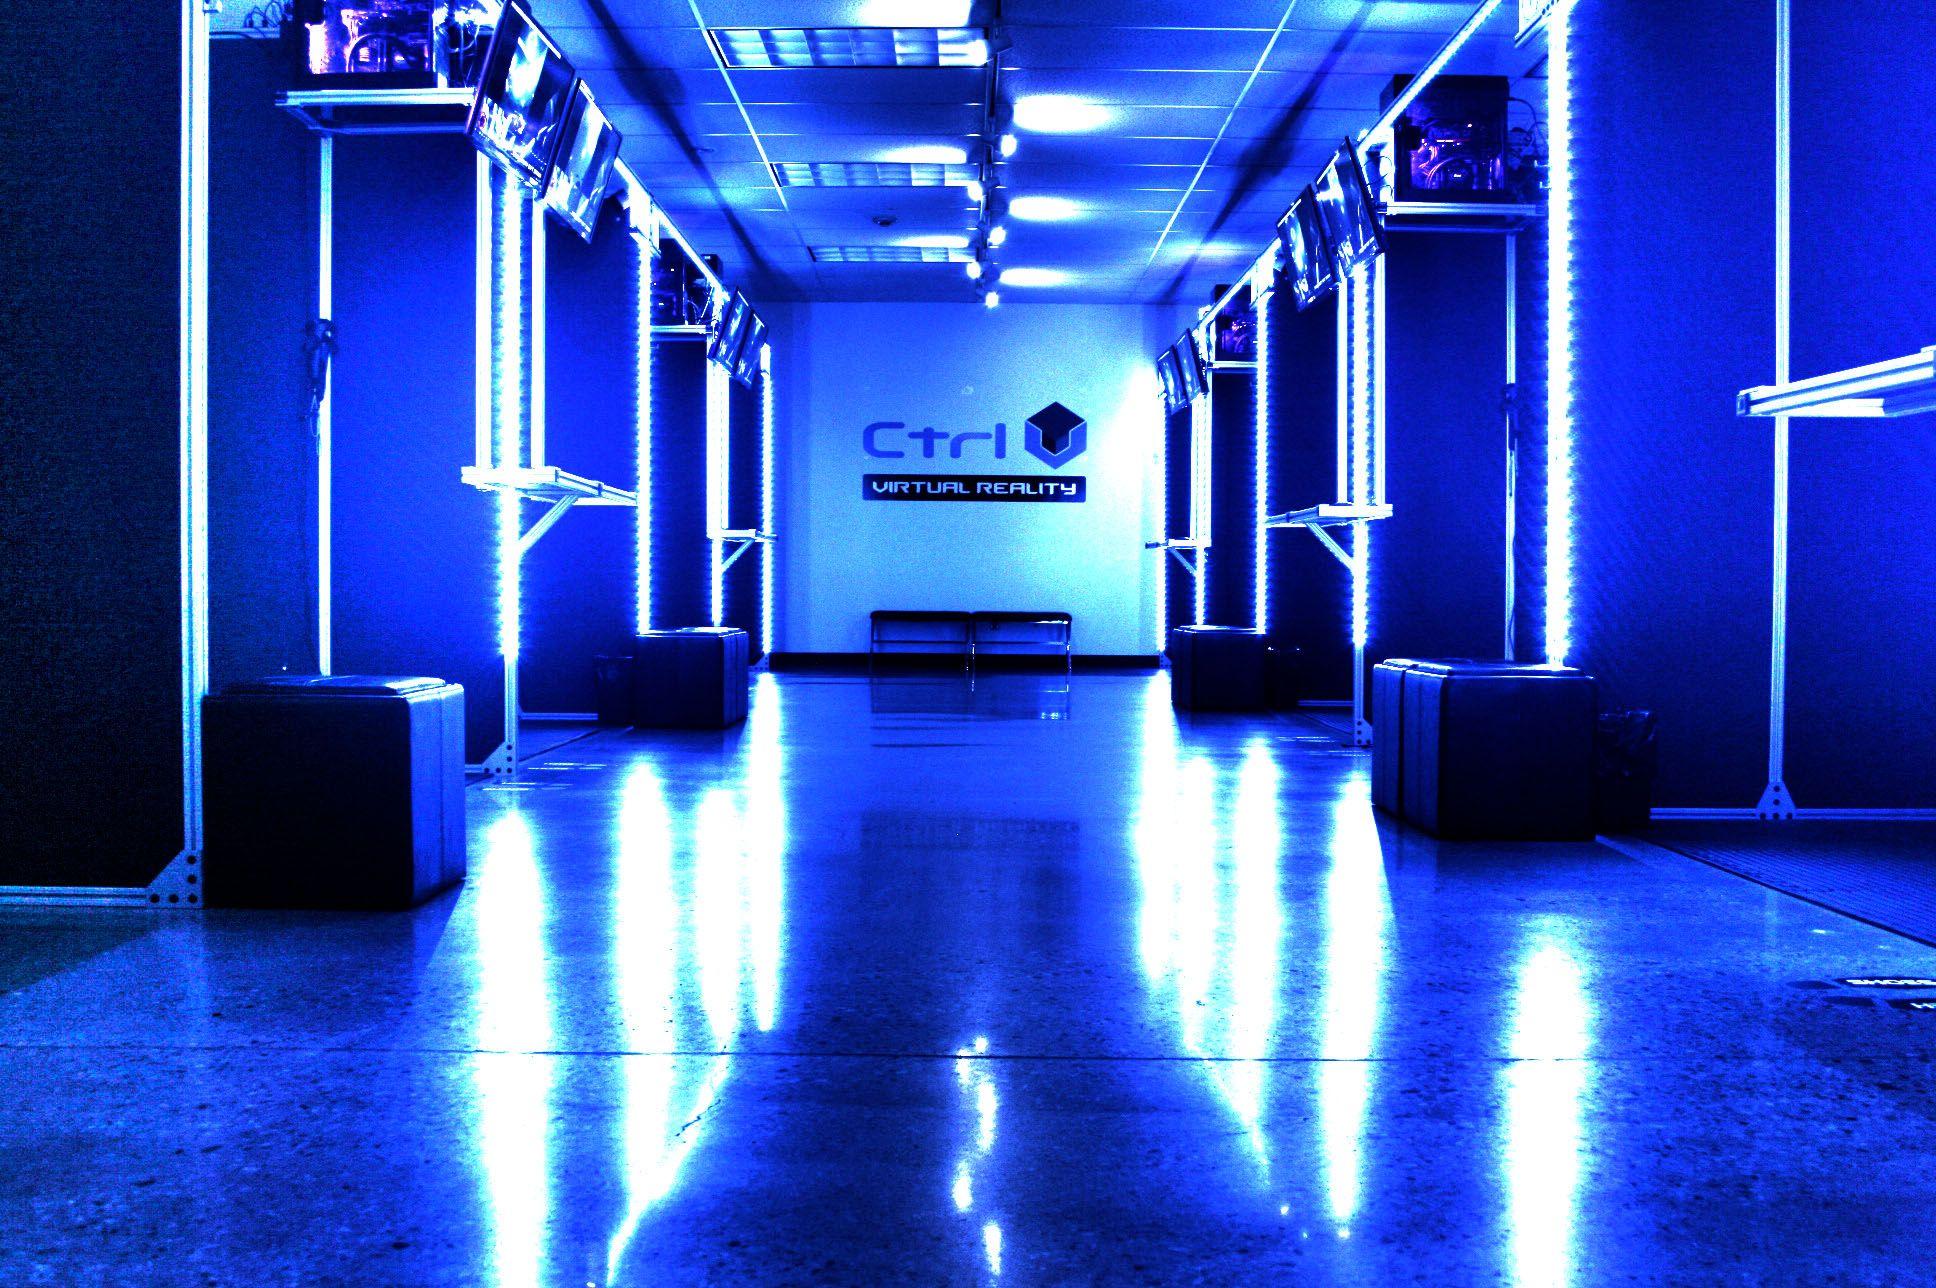 Canada's first virtual reality arcade & gaming hub. Book a